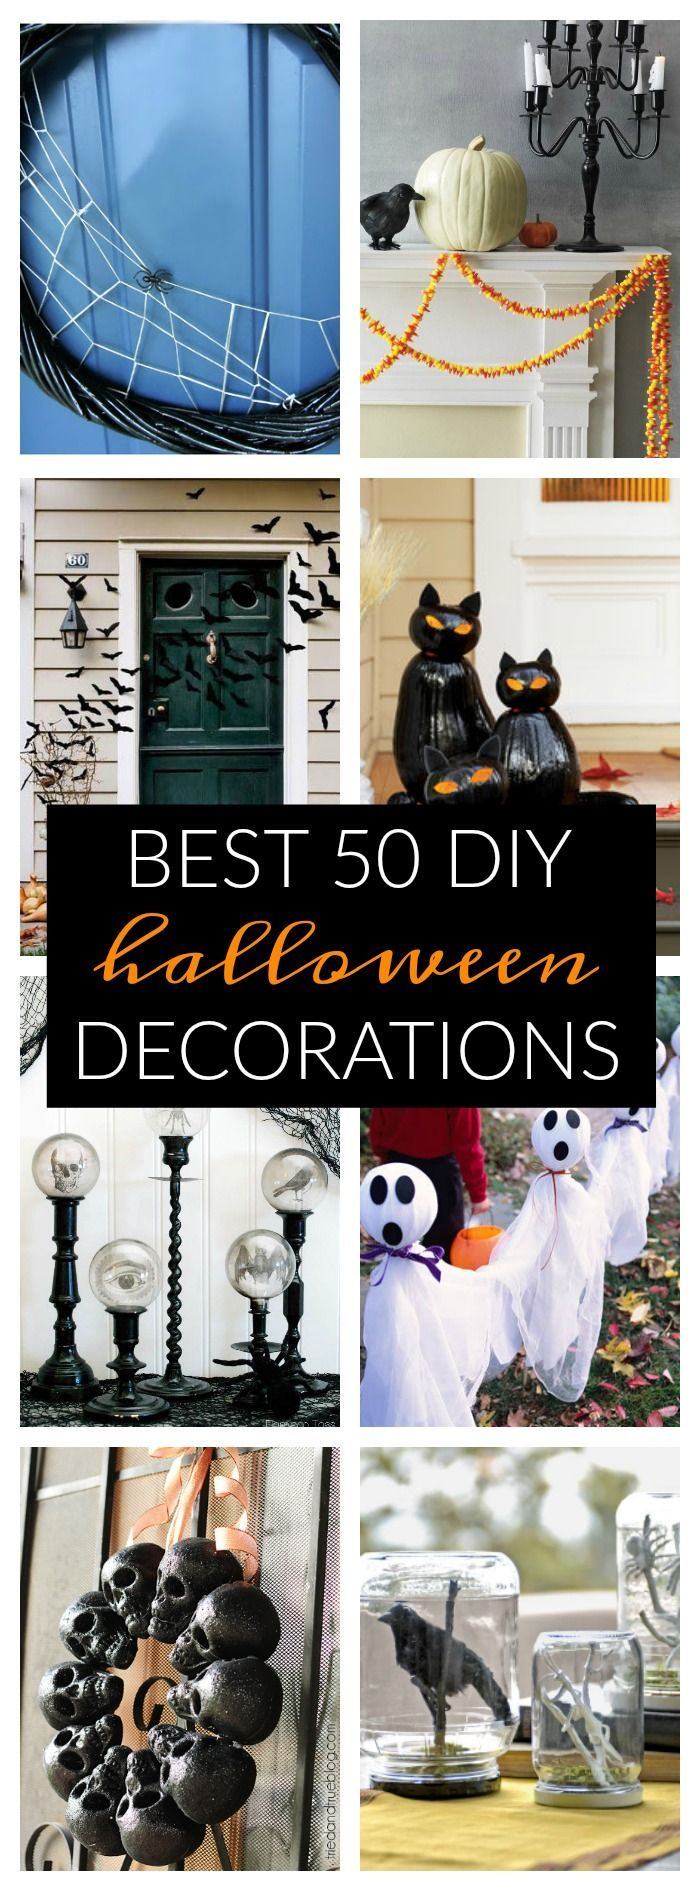 Best 50 Halloween Decorations